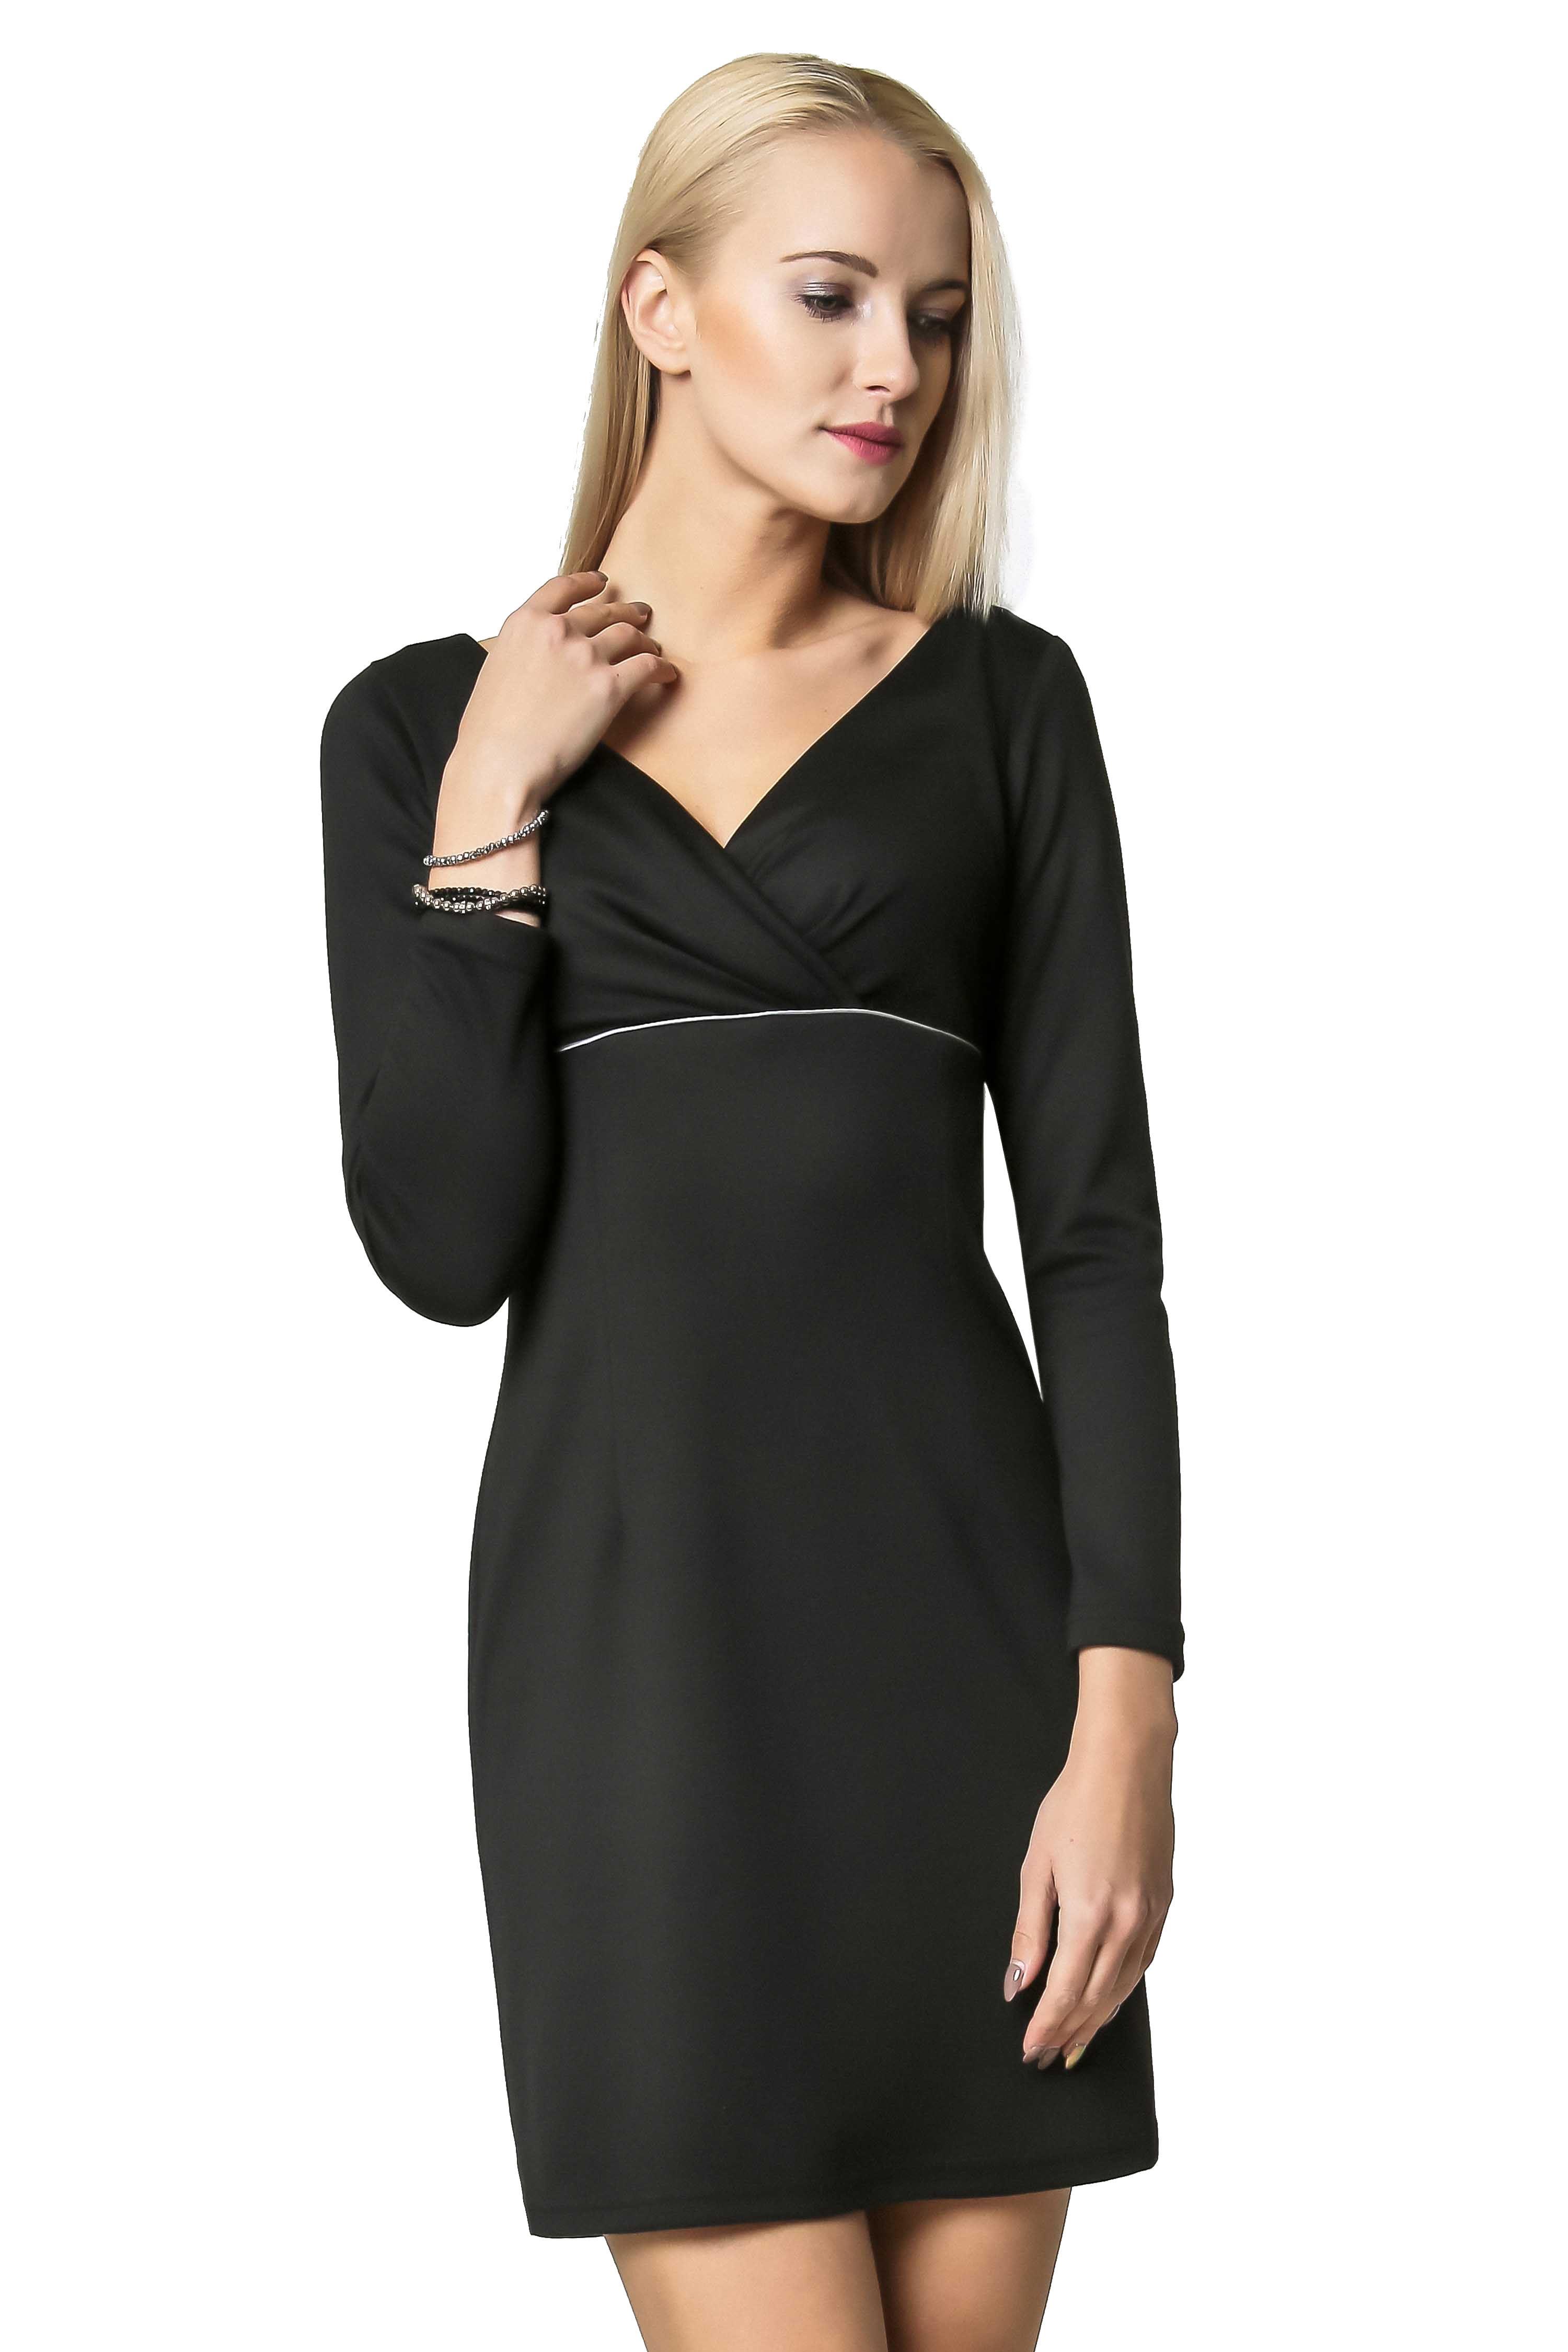 Sukienka Marie Knitwear w kolorze czarnym